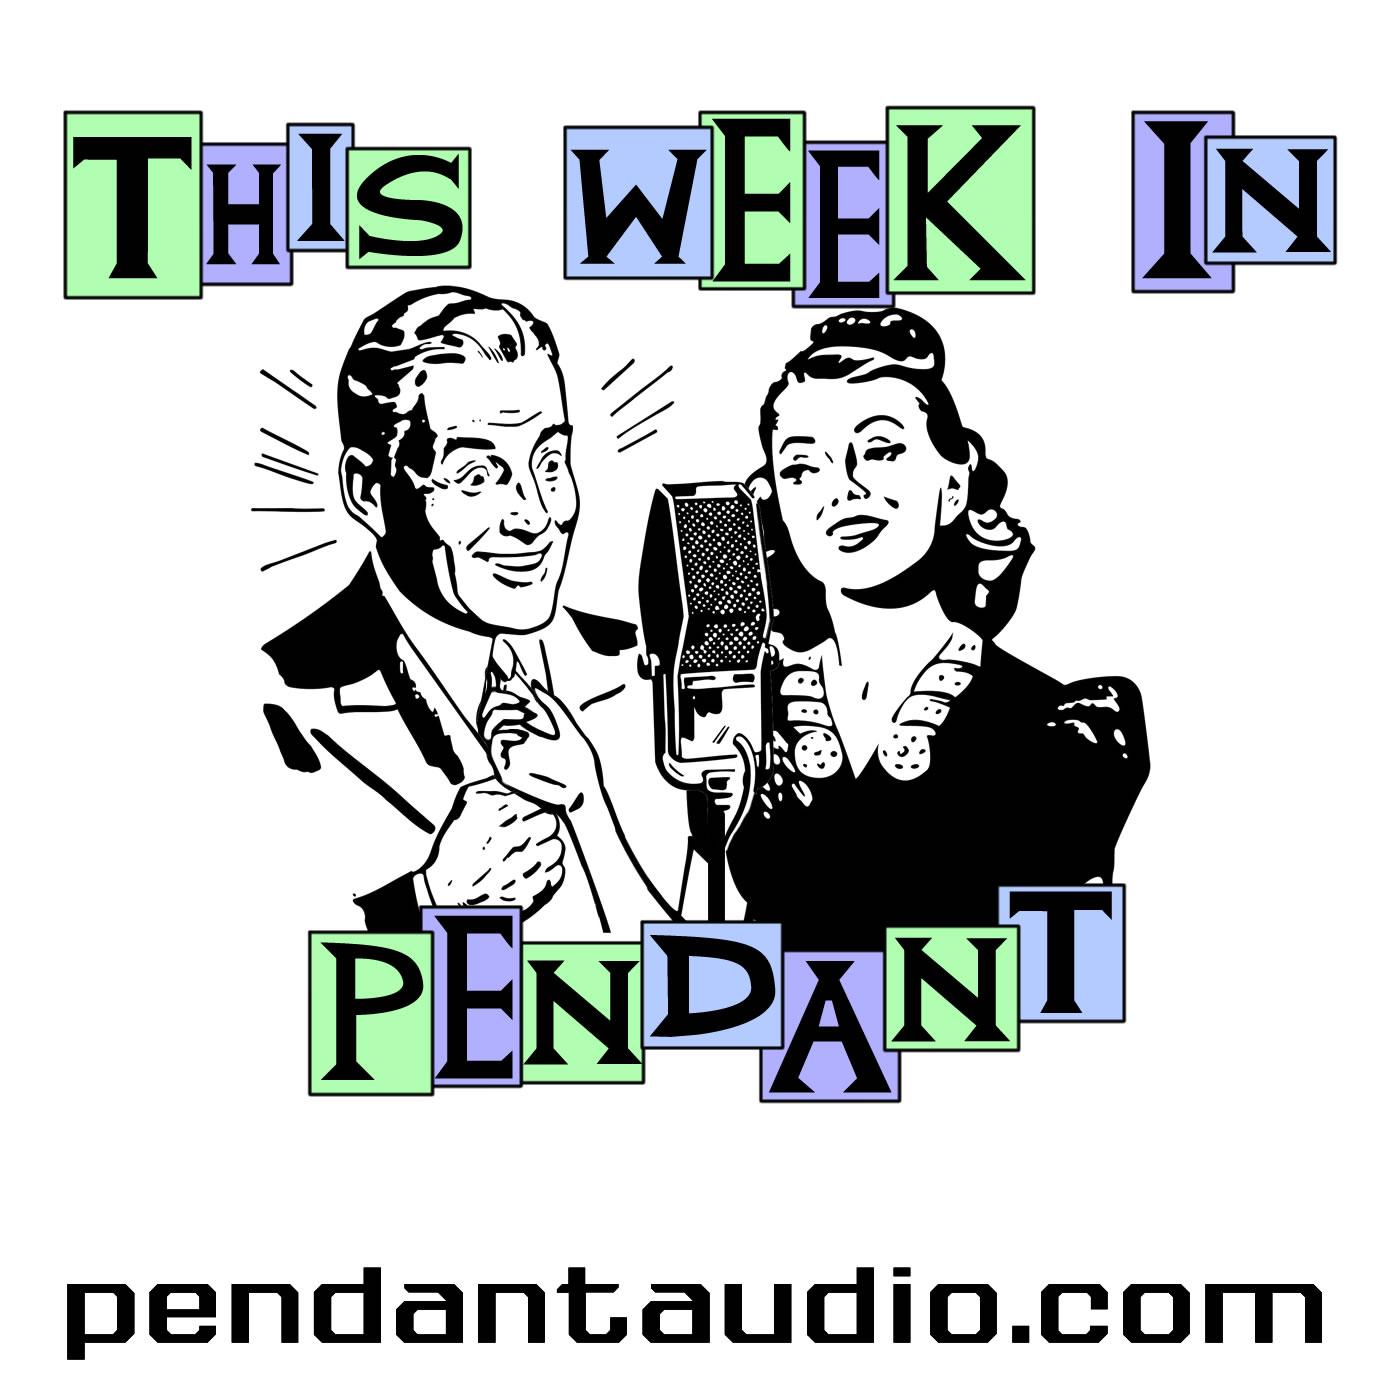 This Week in Pendant | Pendant Audio